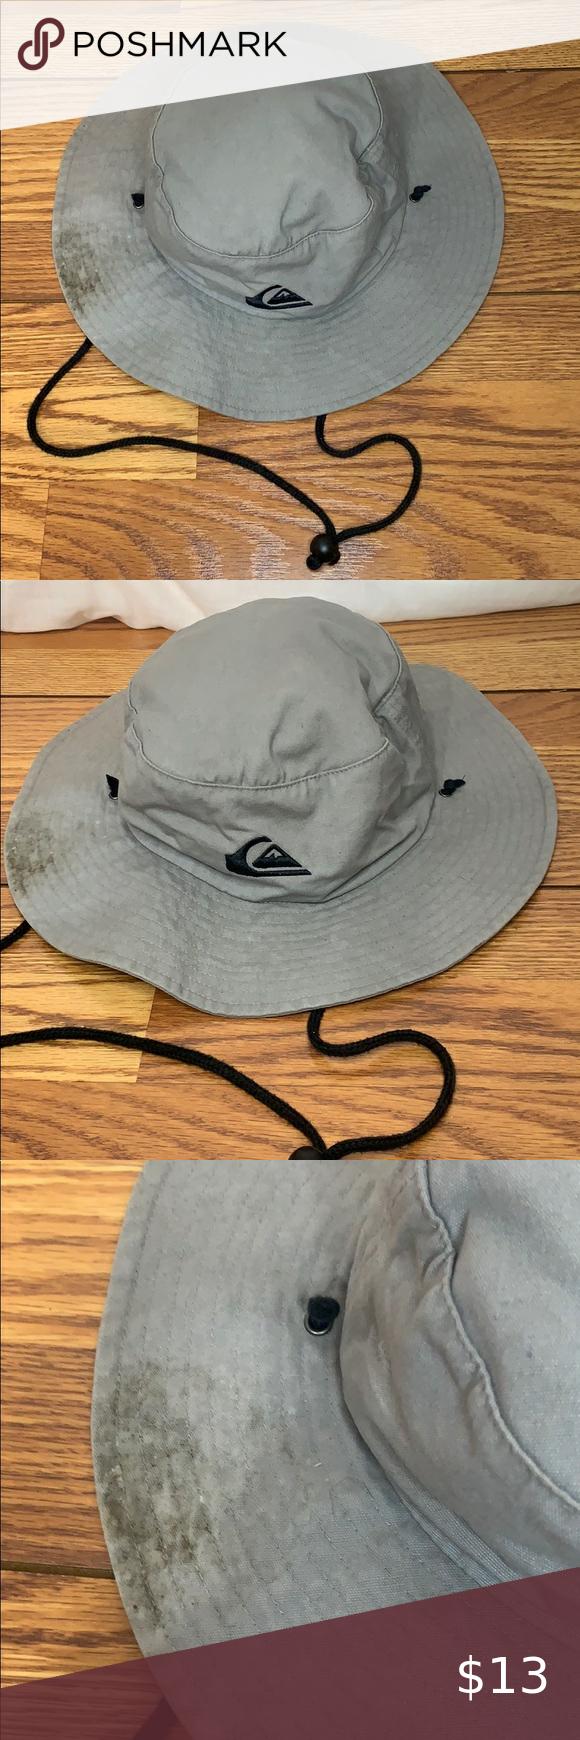 Quicksilver Gray Bucket Fishing Hat Size L Xl Hat Sizes Fishing Hat Hats For Men